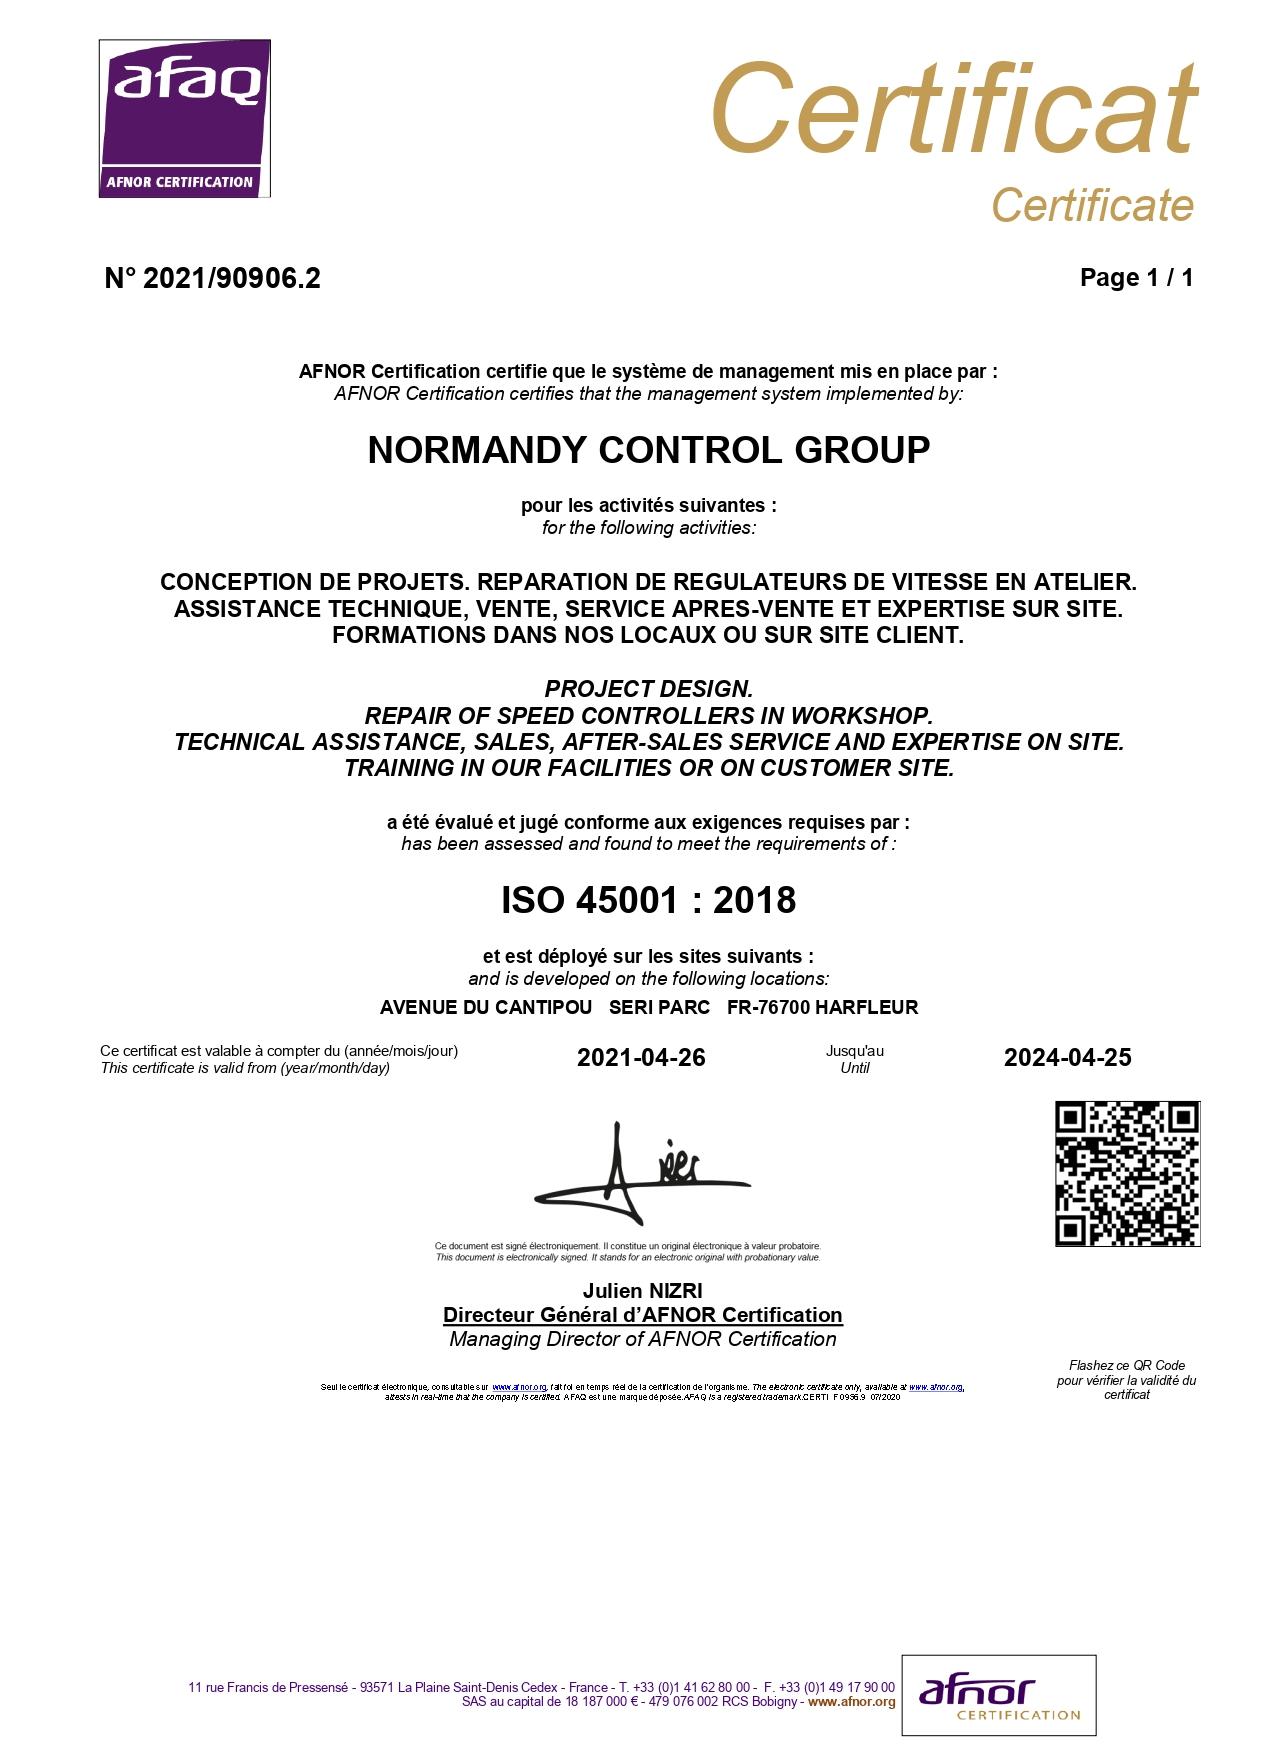 ISO 45001 AFNOR